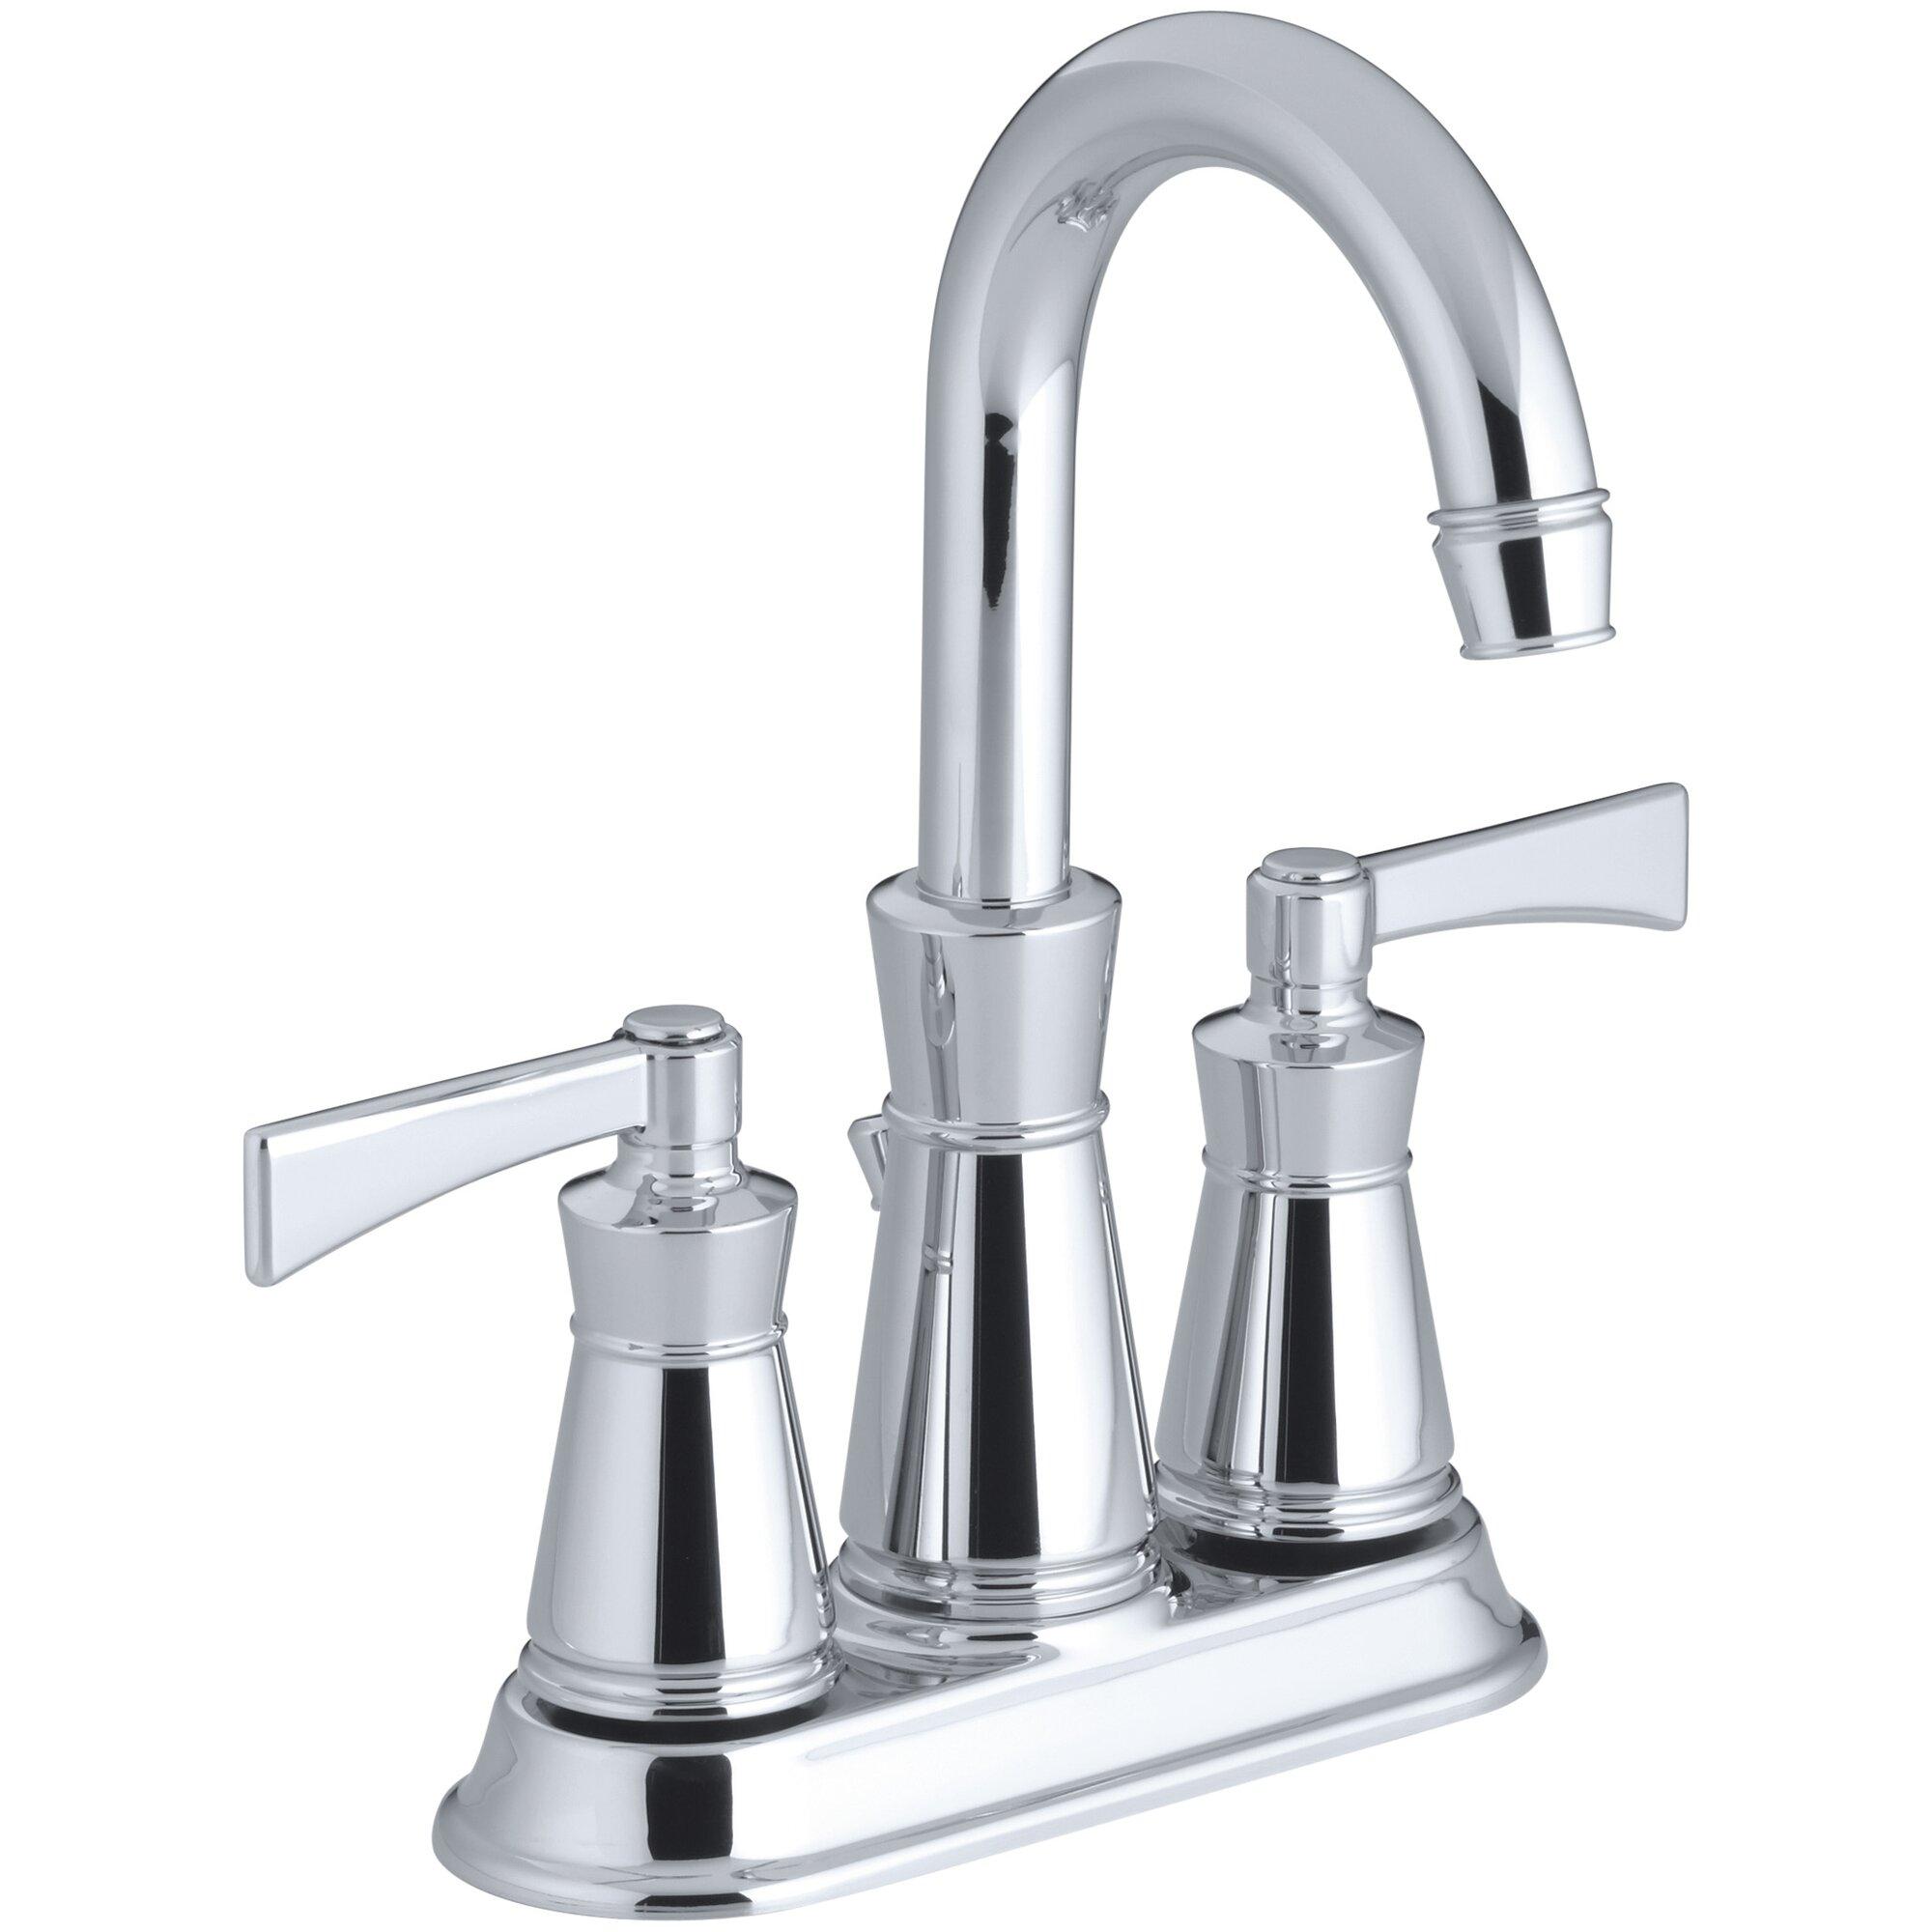 Archer Centerset Bathroom Sink Faucet